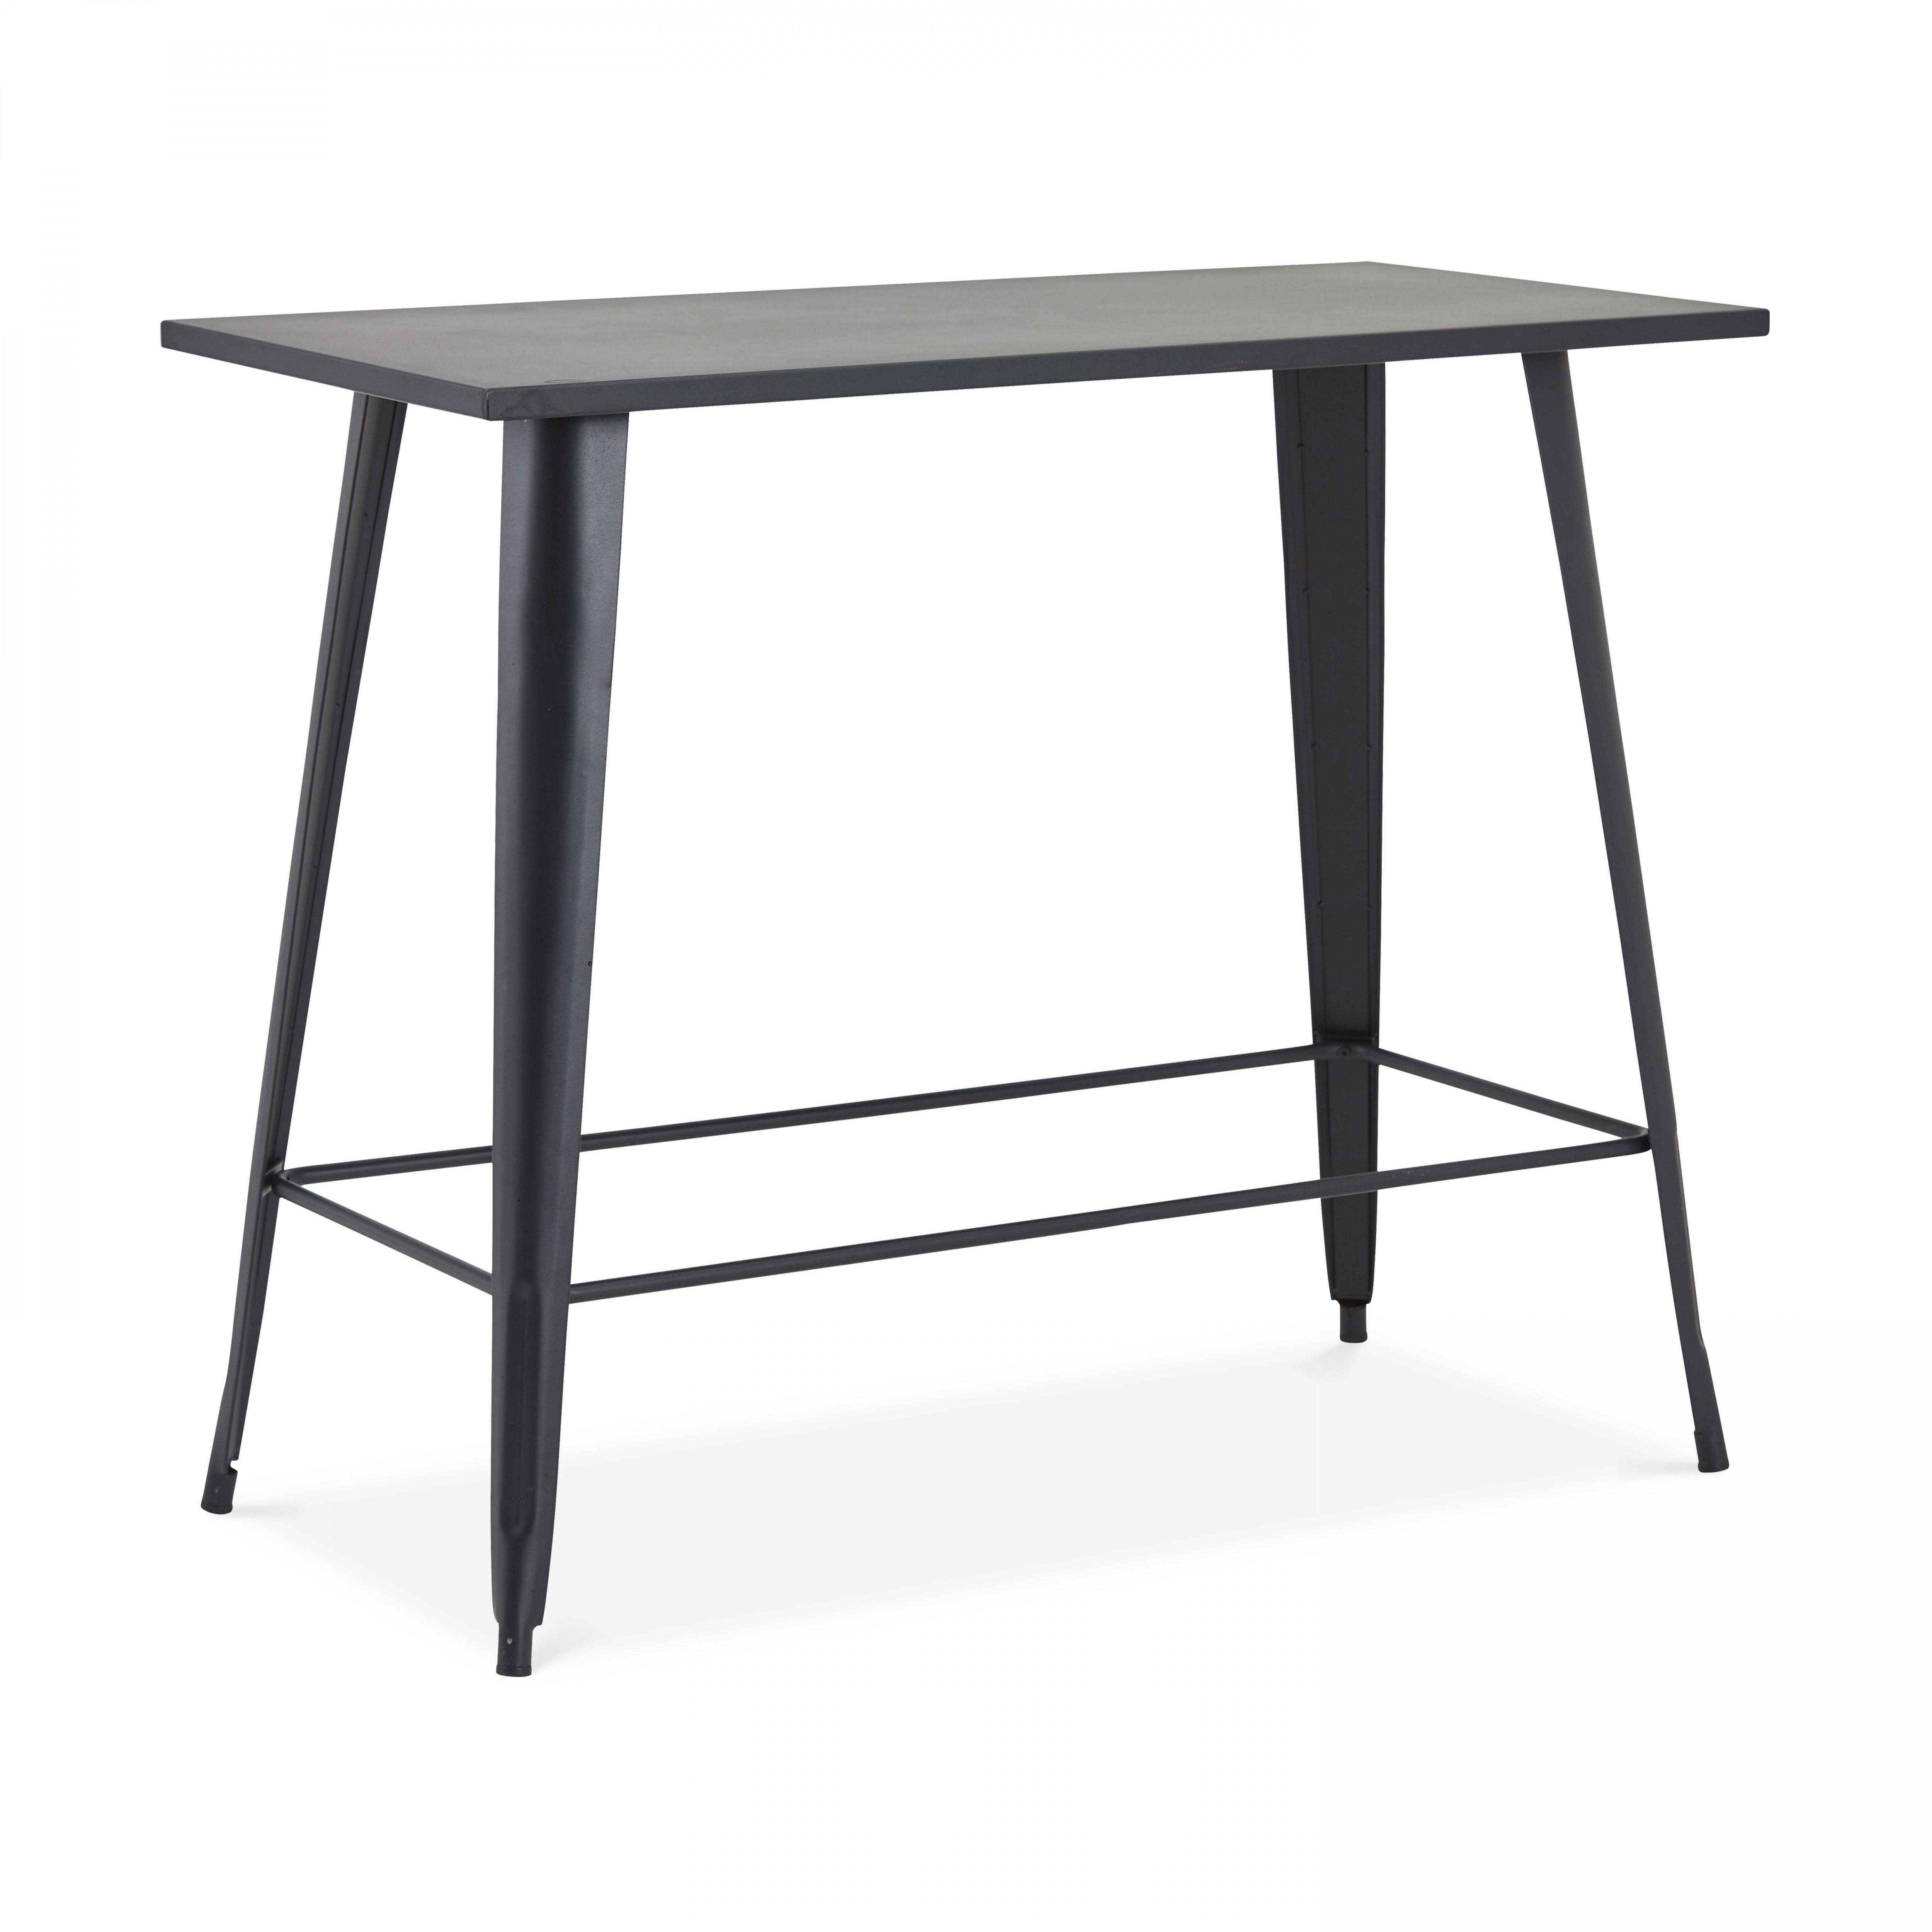 Table haute de jardin en métal noir mat noir